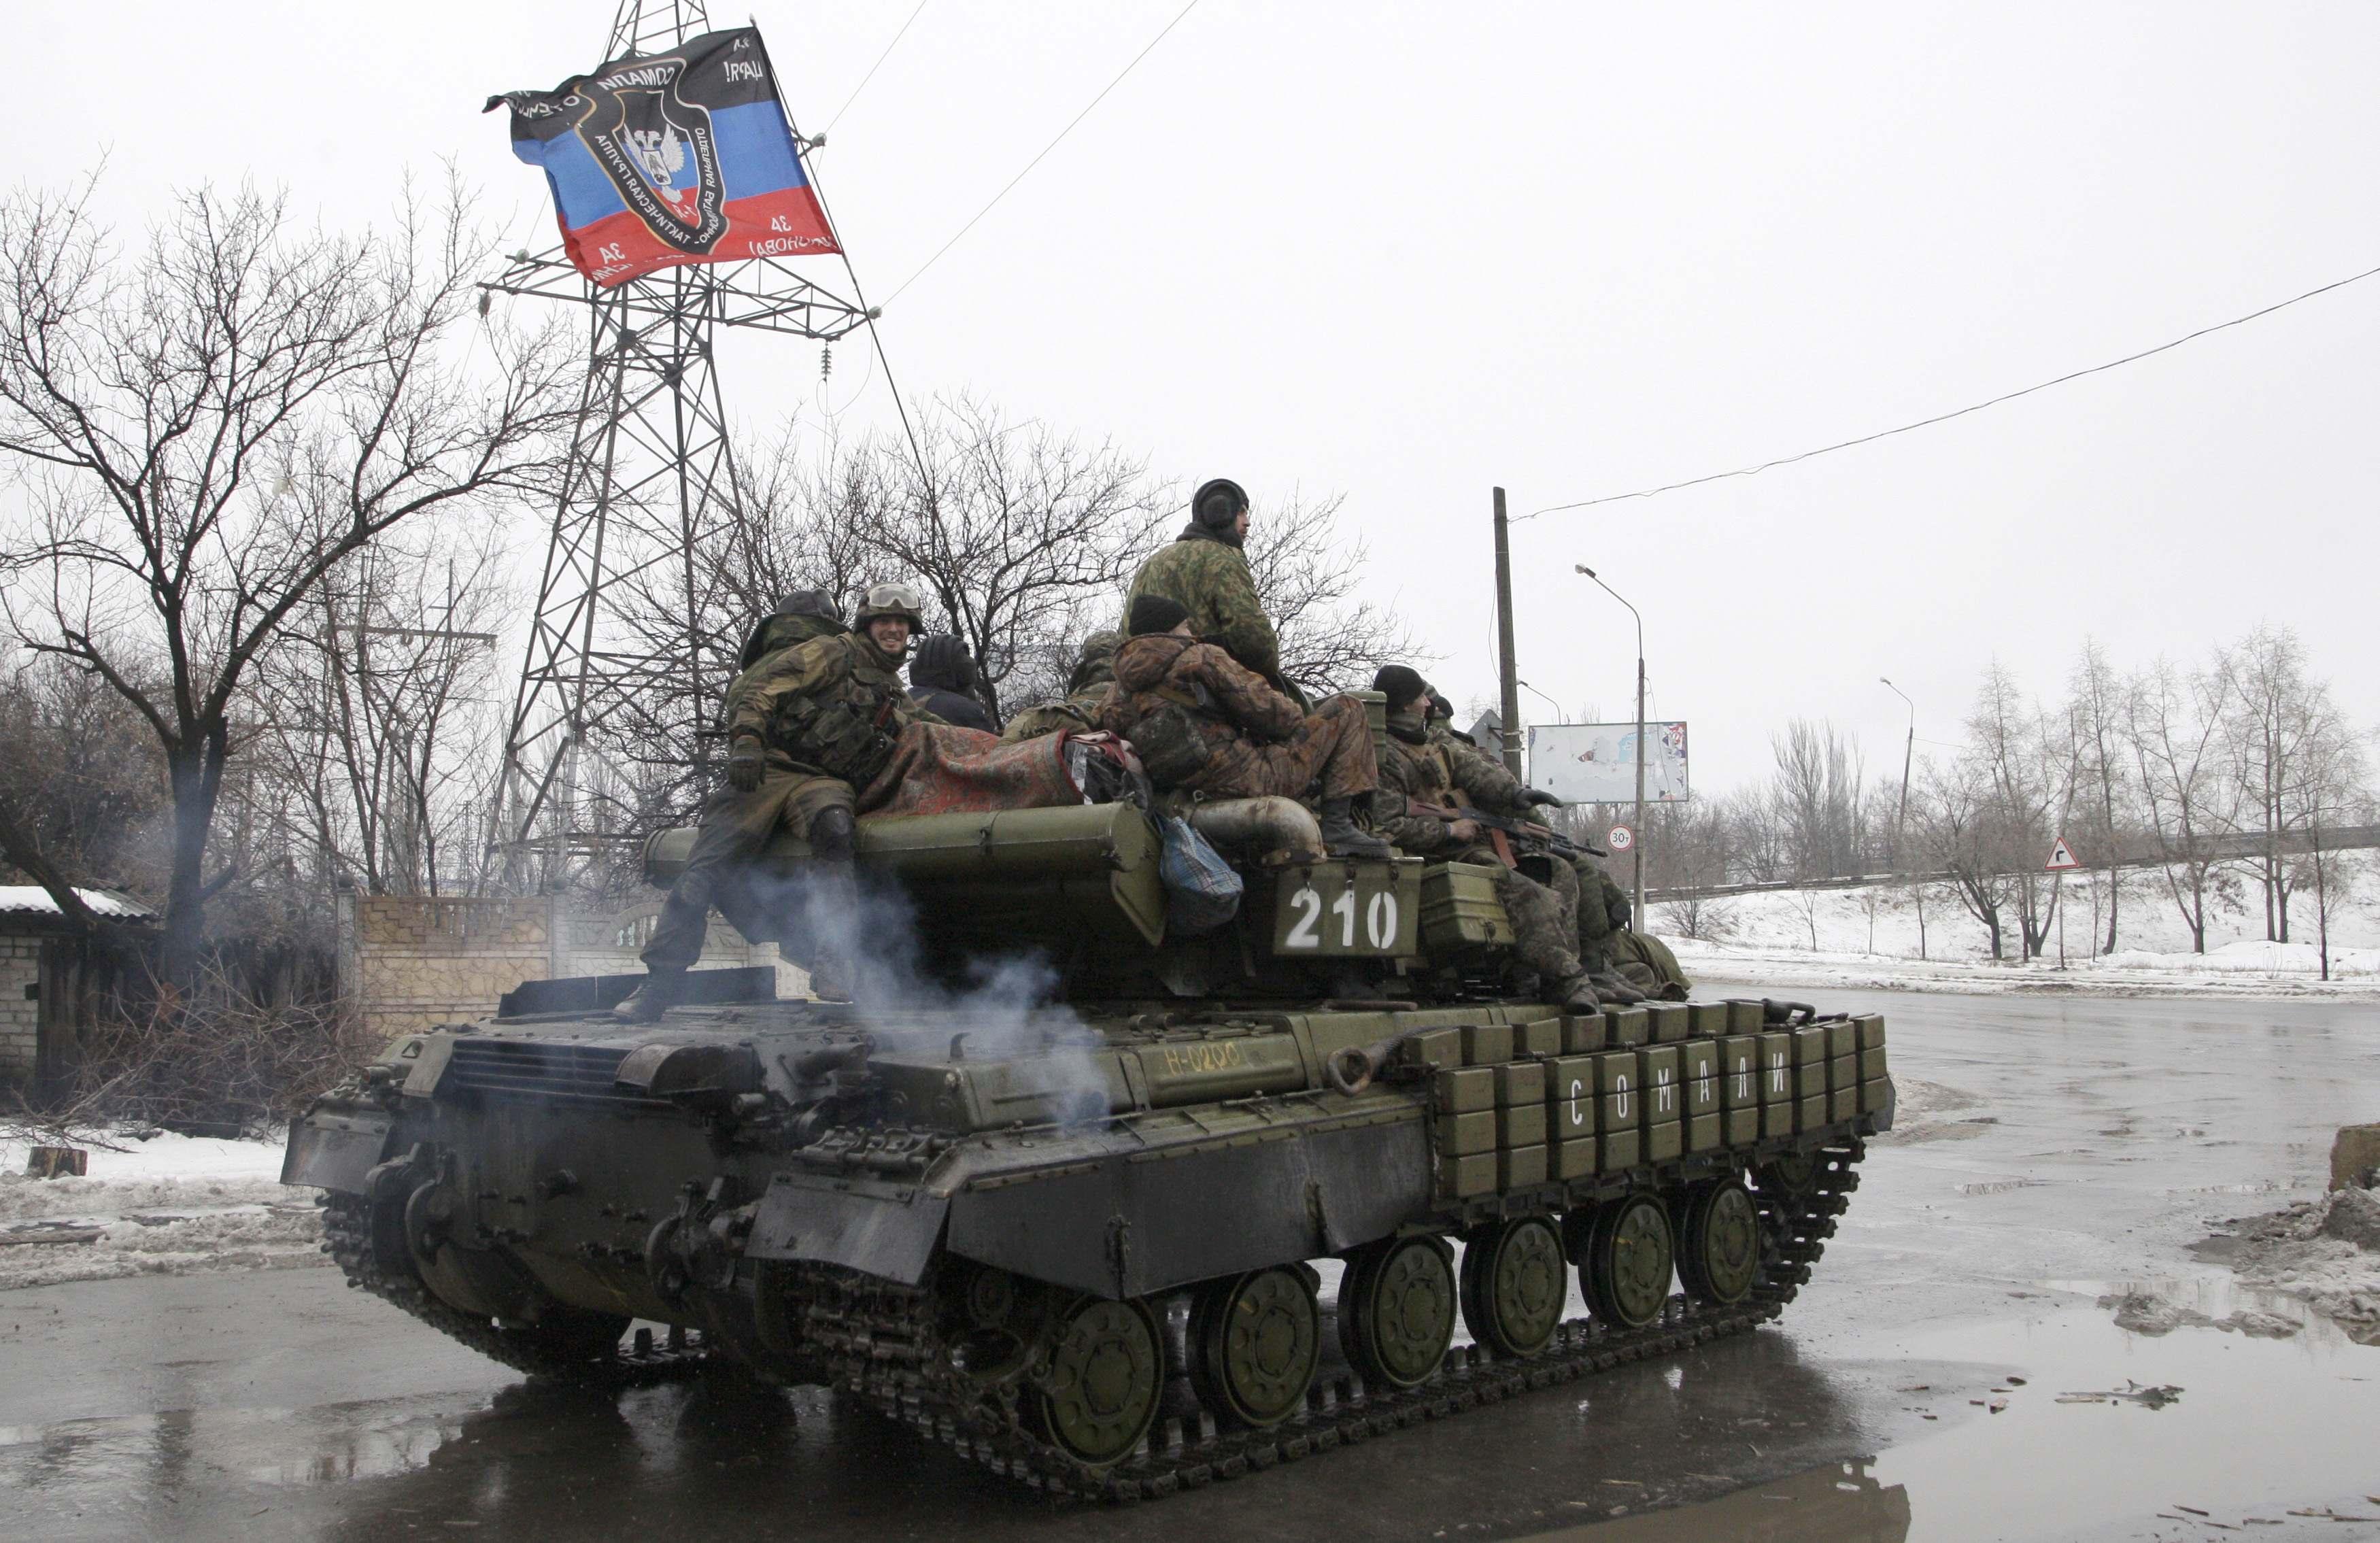 Донецк, ДНР, Денбальцево, Донбасс, ато, нацгвардия, армия украины, всу, нацгвардия